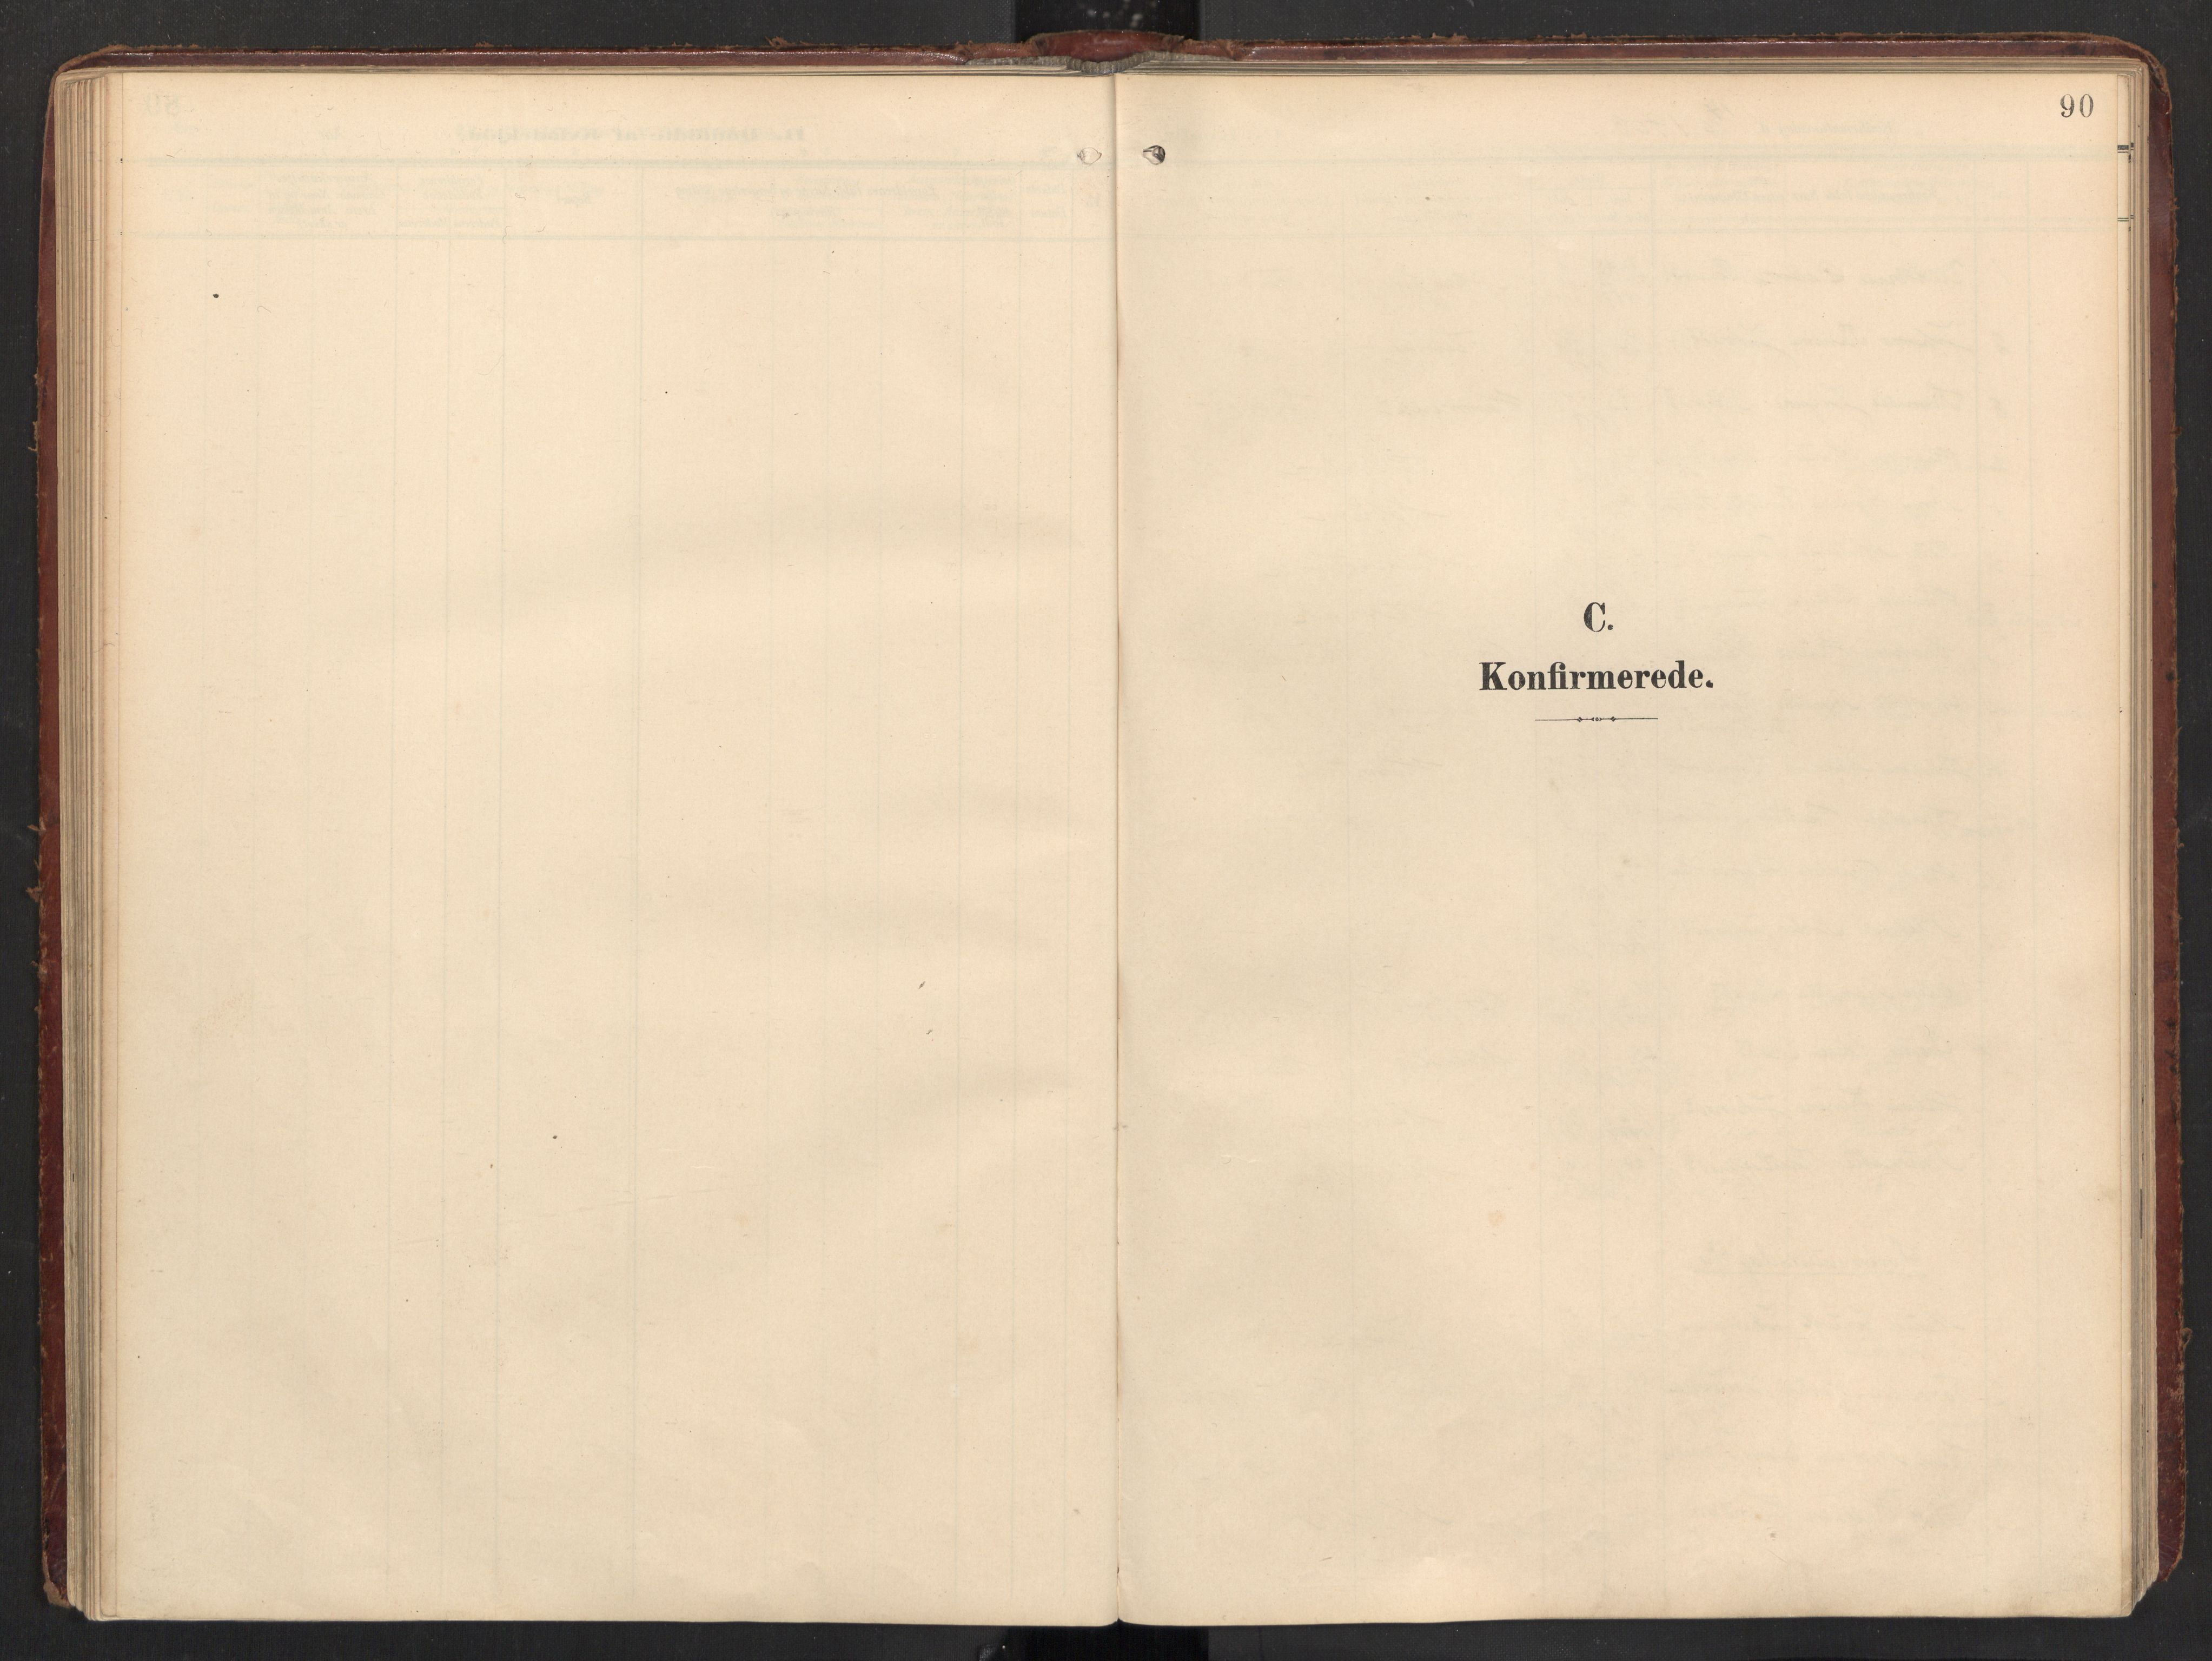 SAT, Ministerialprotokoller, klokkerbøker og fødselsregistre - Nordland, 890/L1287: Ministerialbok nr. 890A02, 1903-1915, s. 90